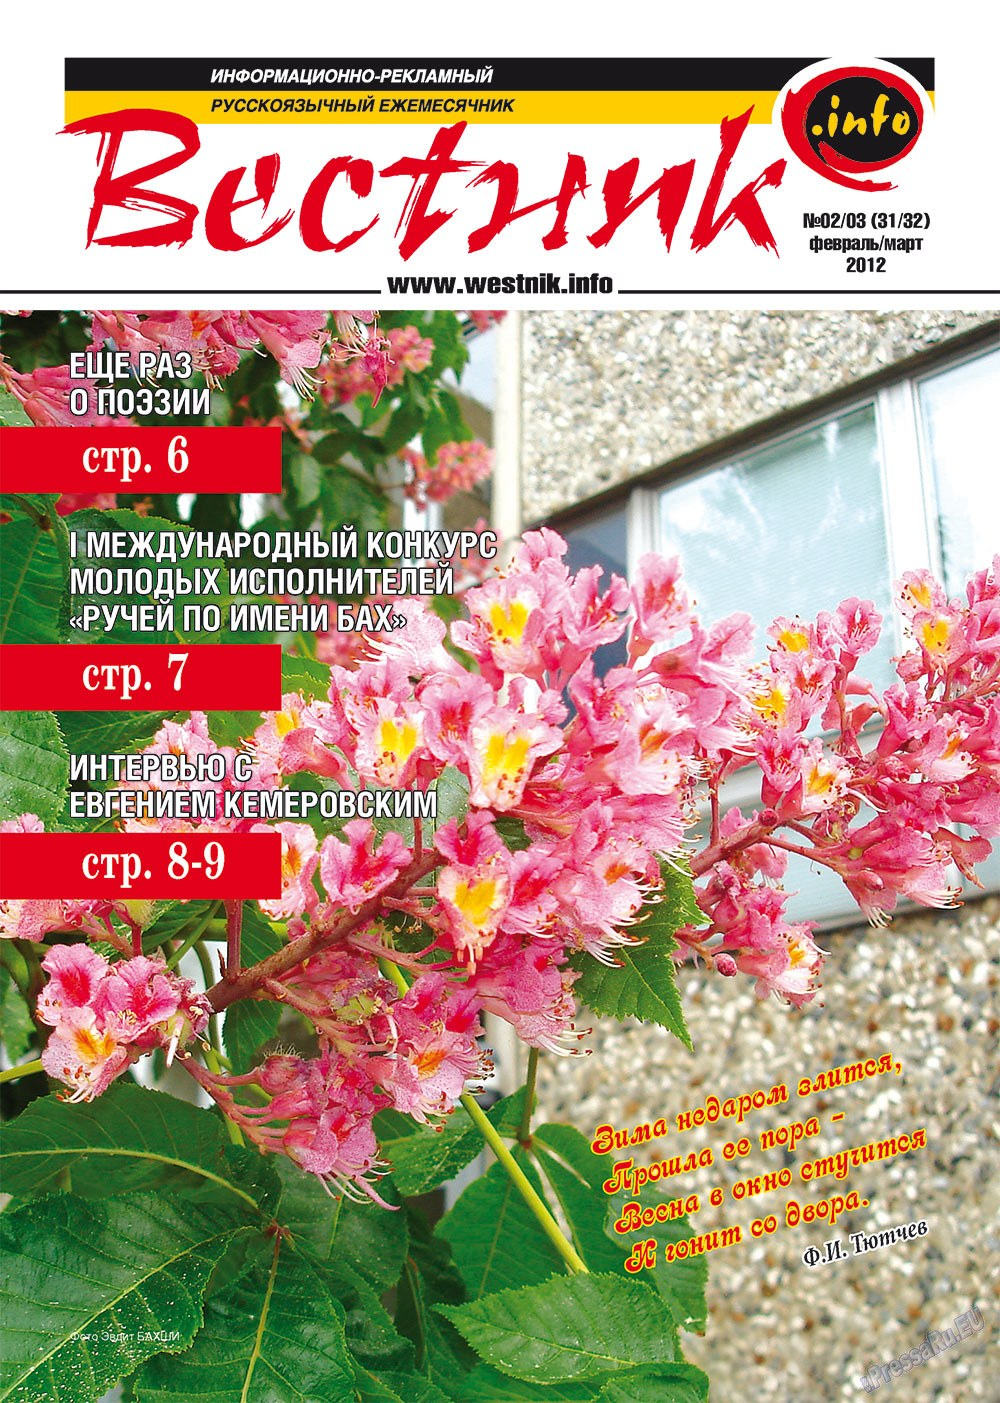 Вестник-info (журнал). 2012 год, номер 2, стр. 1